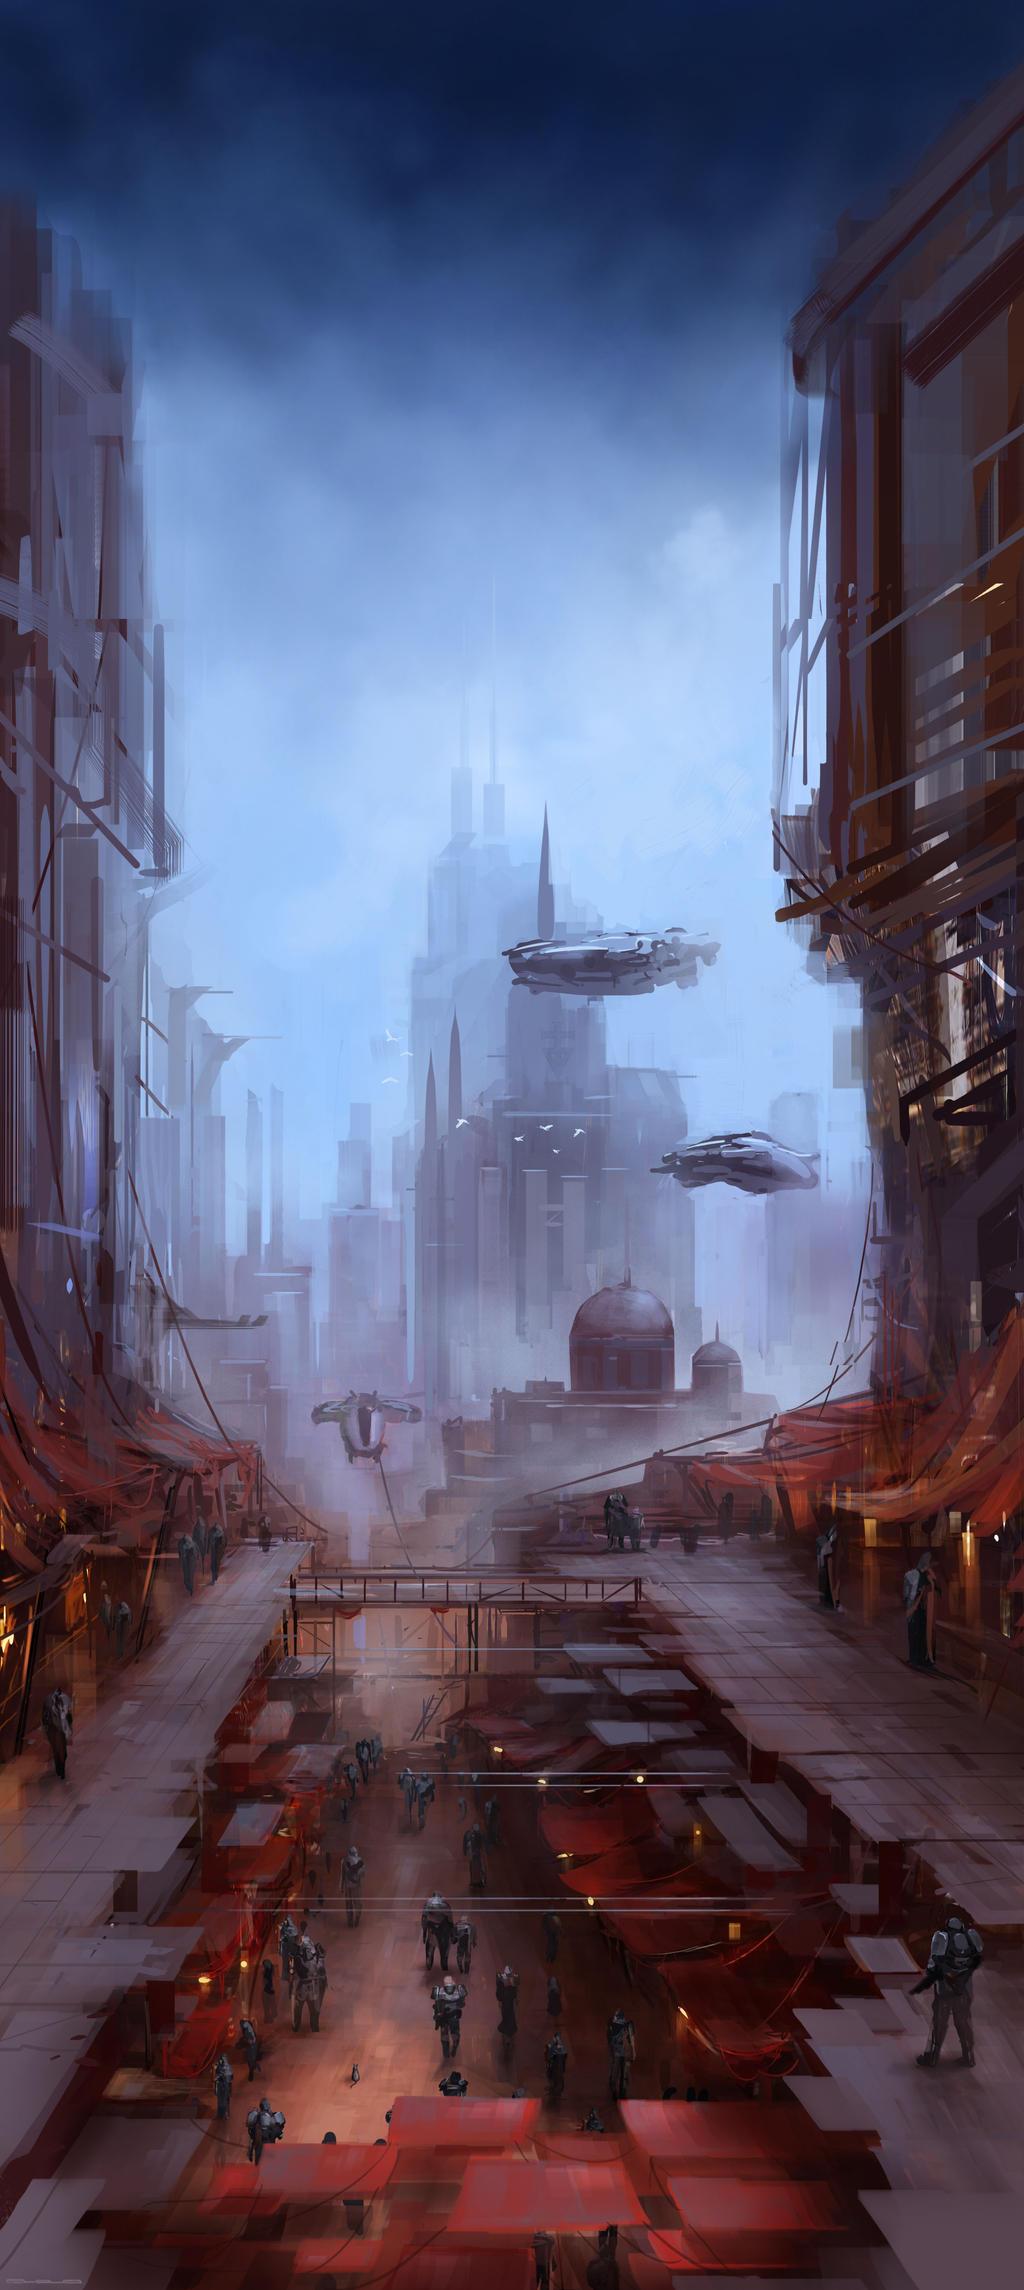 Red Market by Darkcloud013